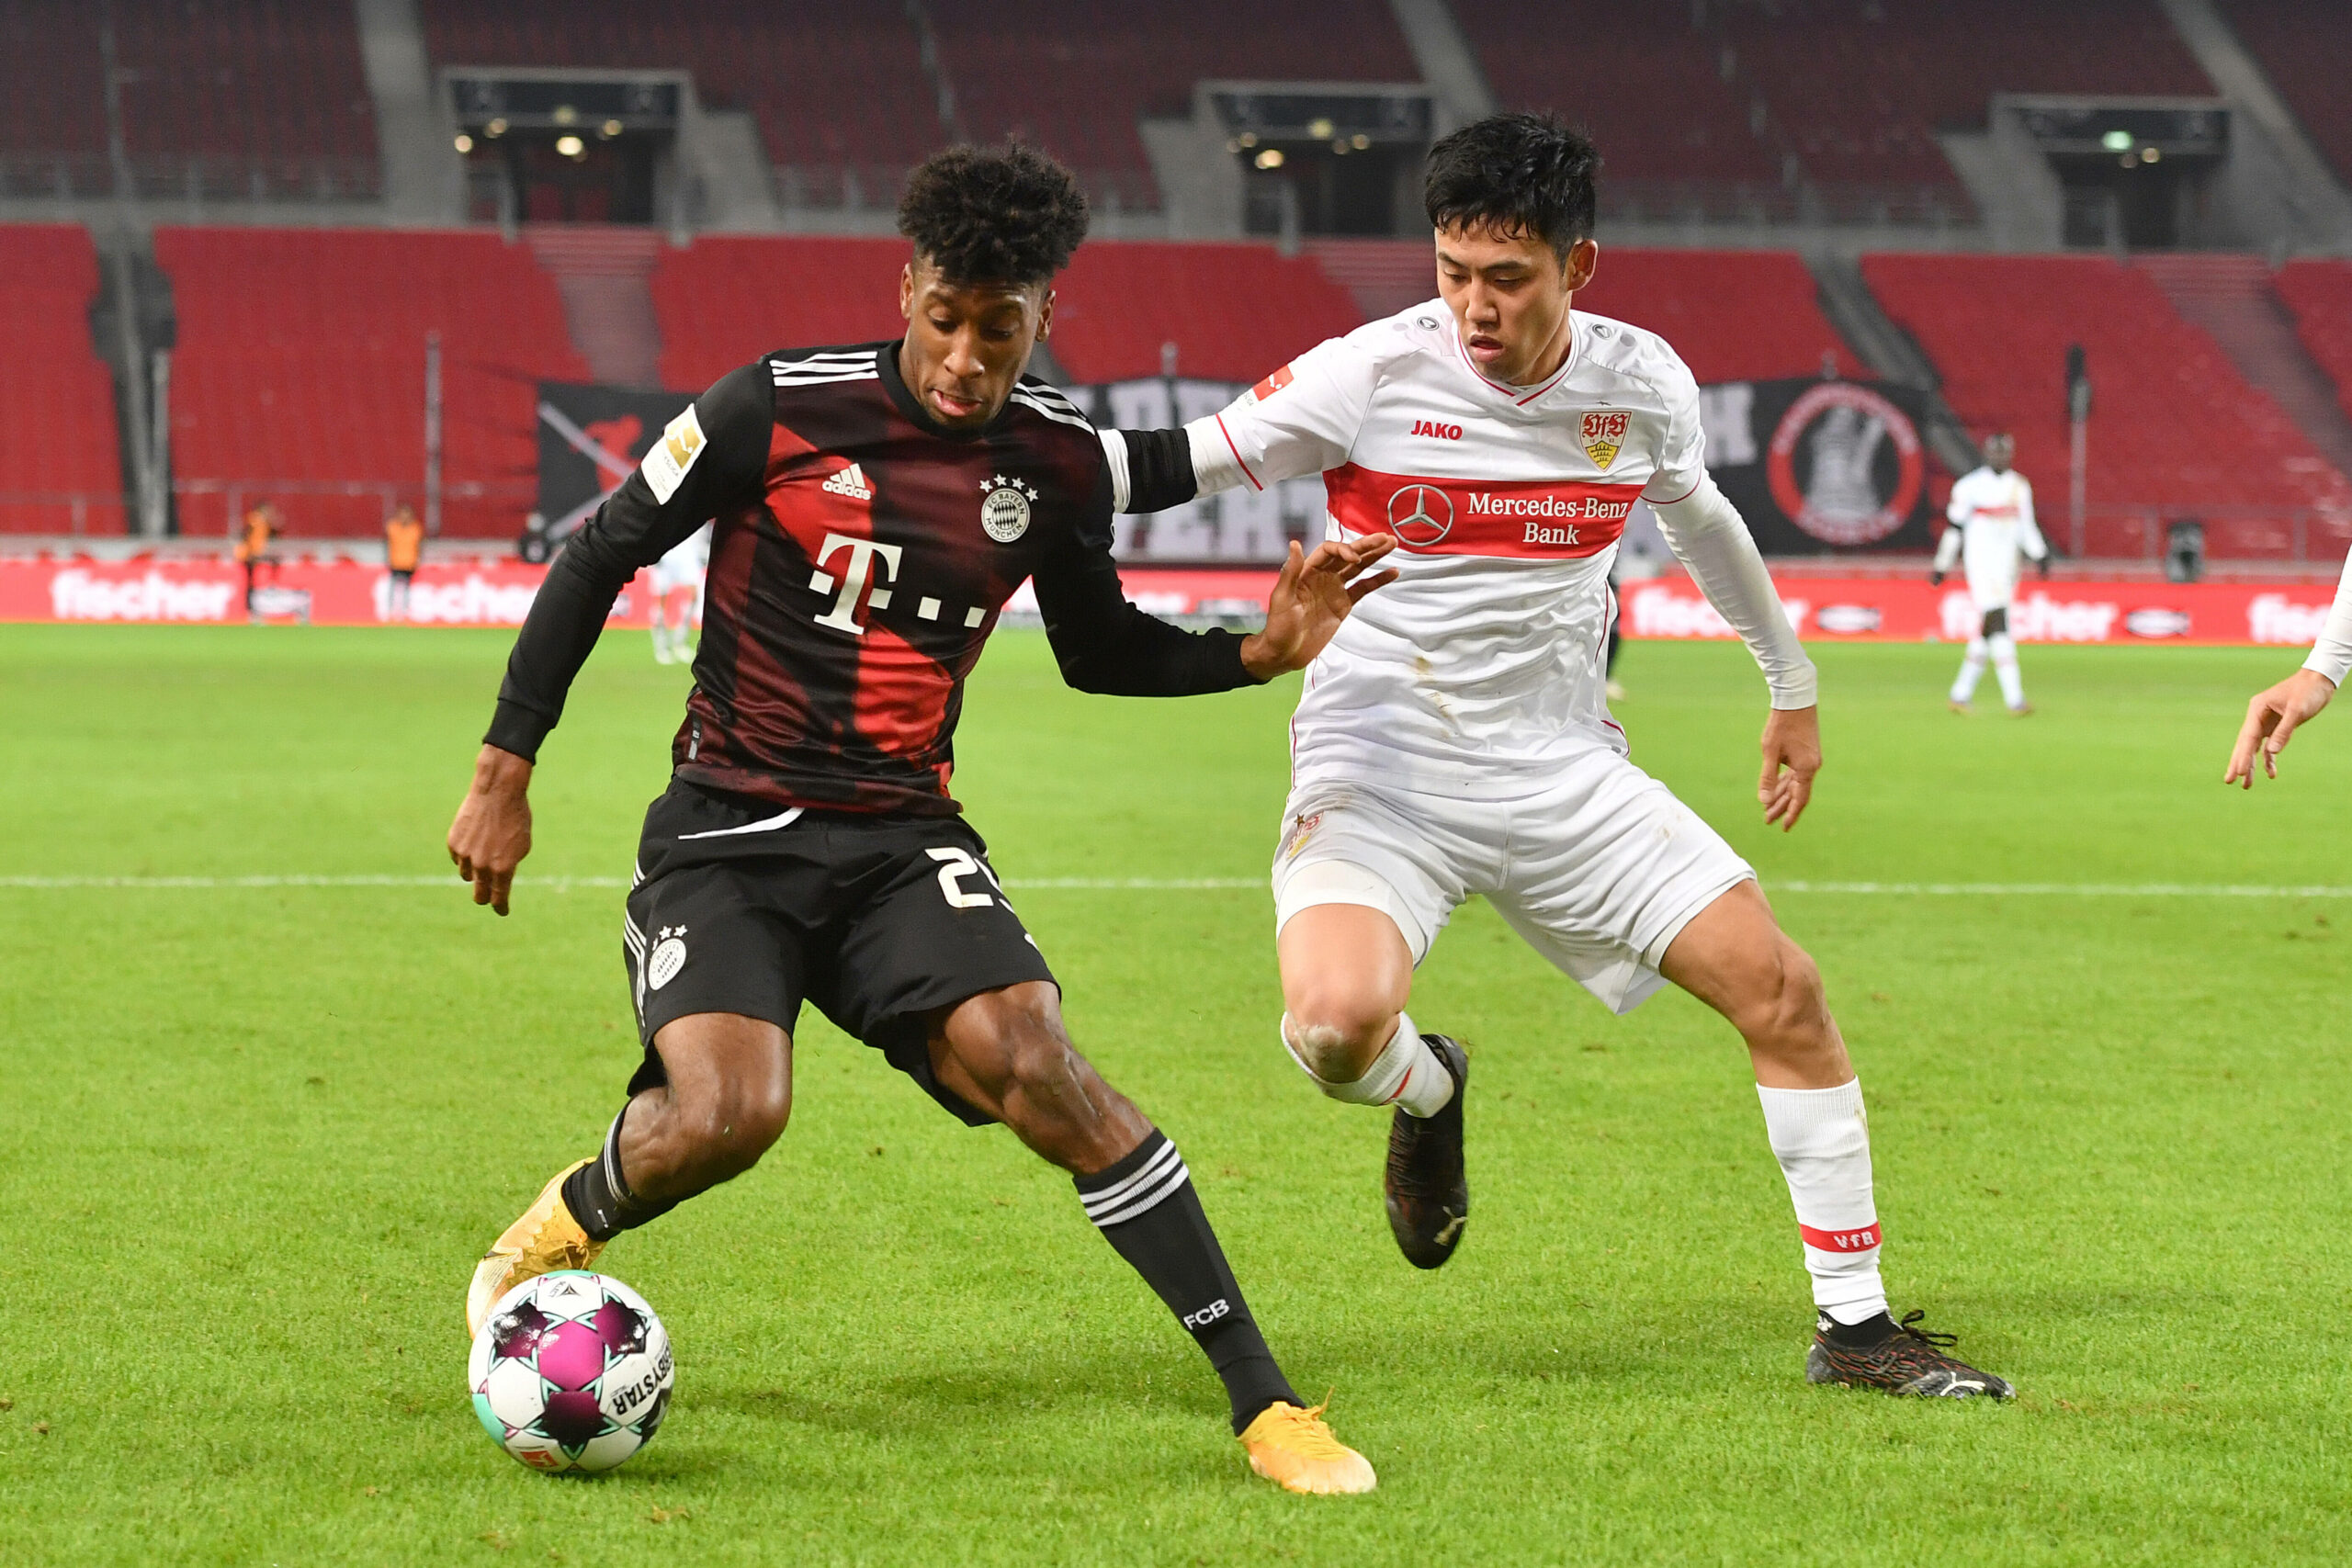 FC Bayern vs. VfB Stuttgart